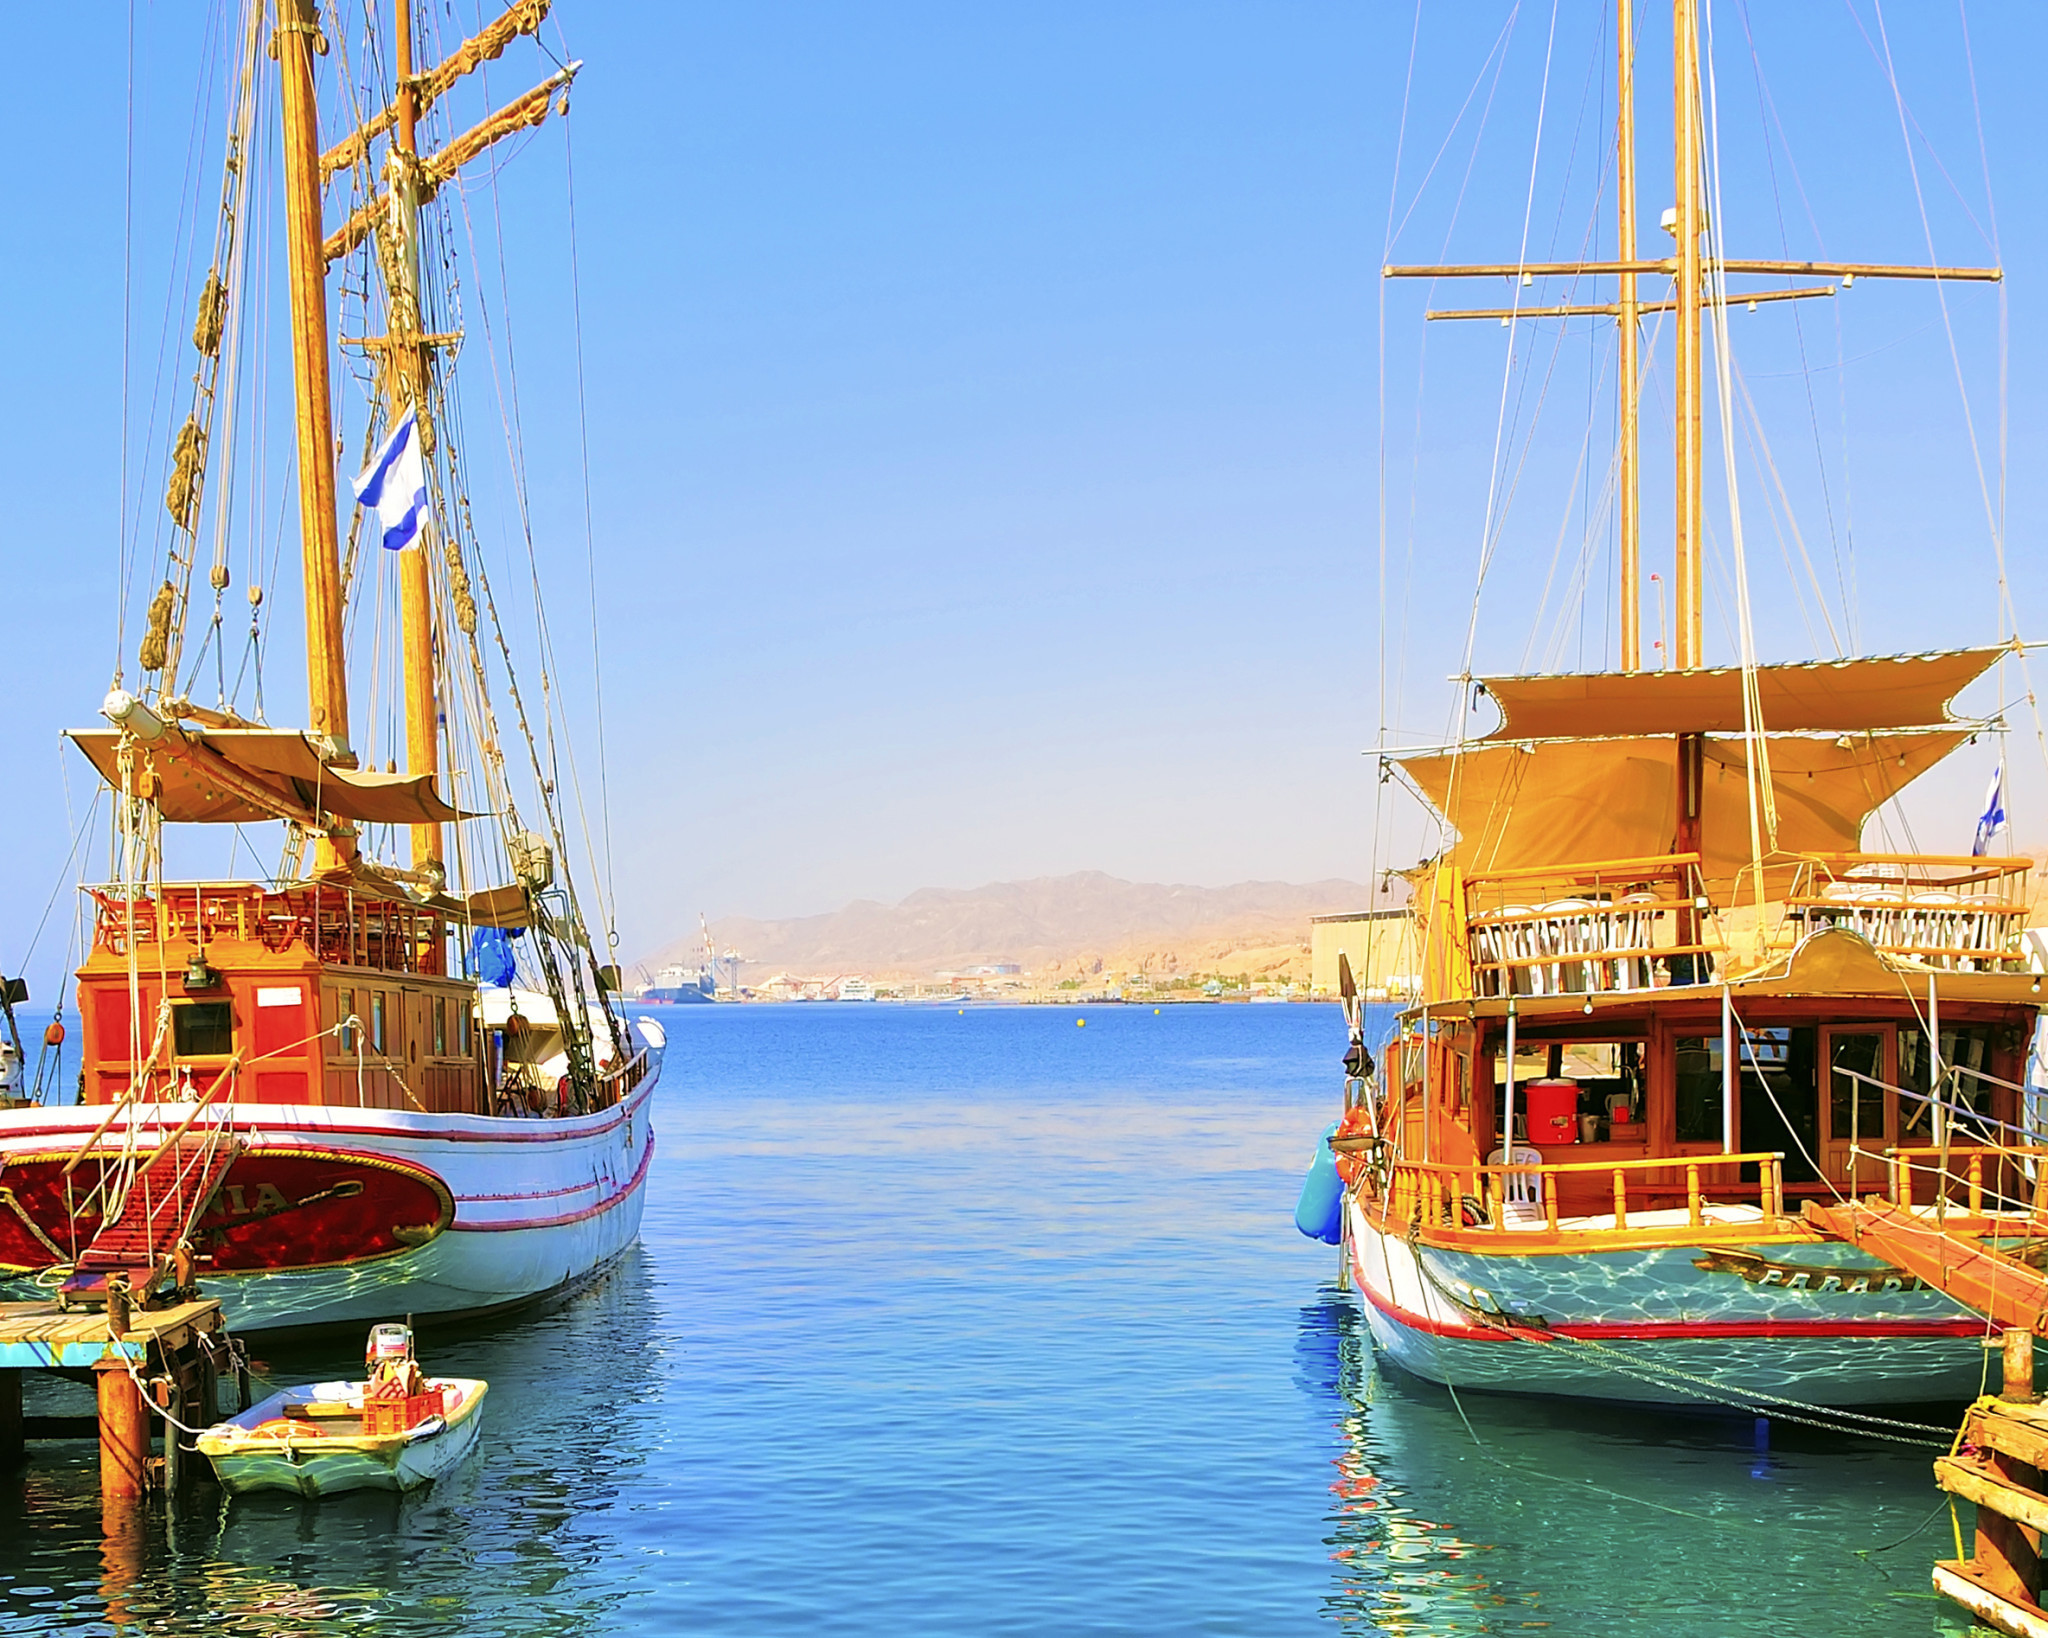 Израильский курорт Эйлат: берег желанный